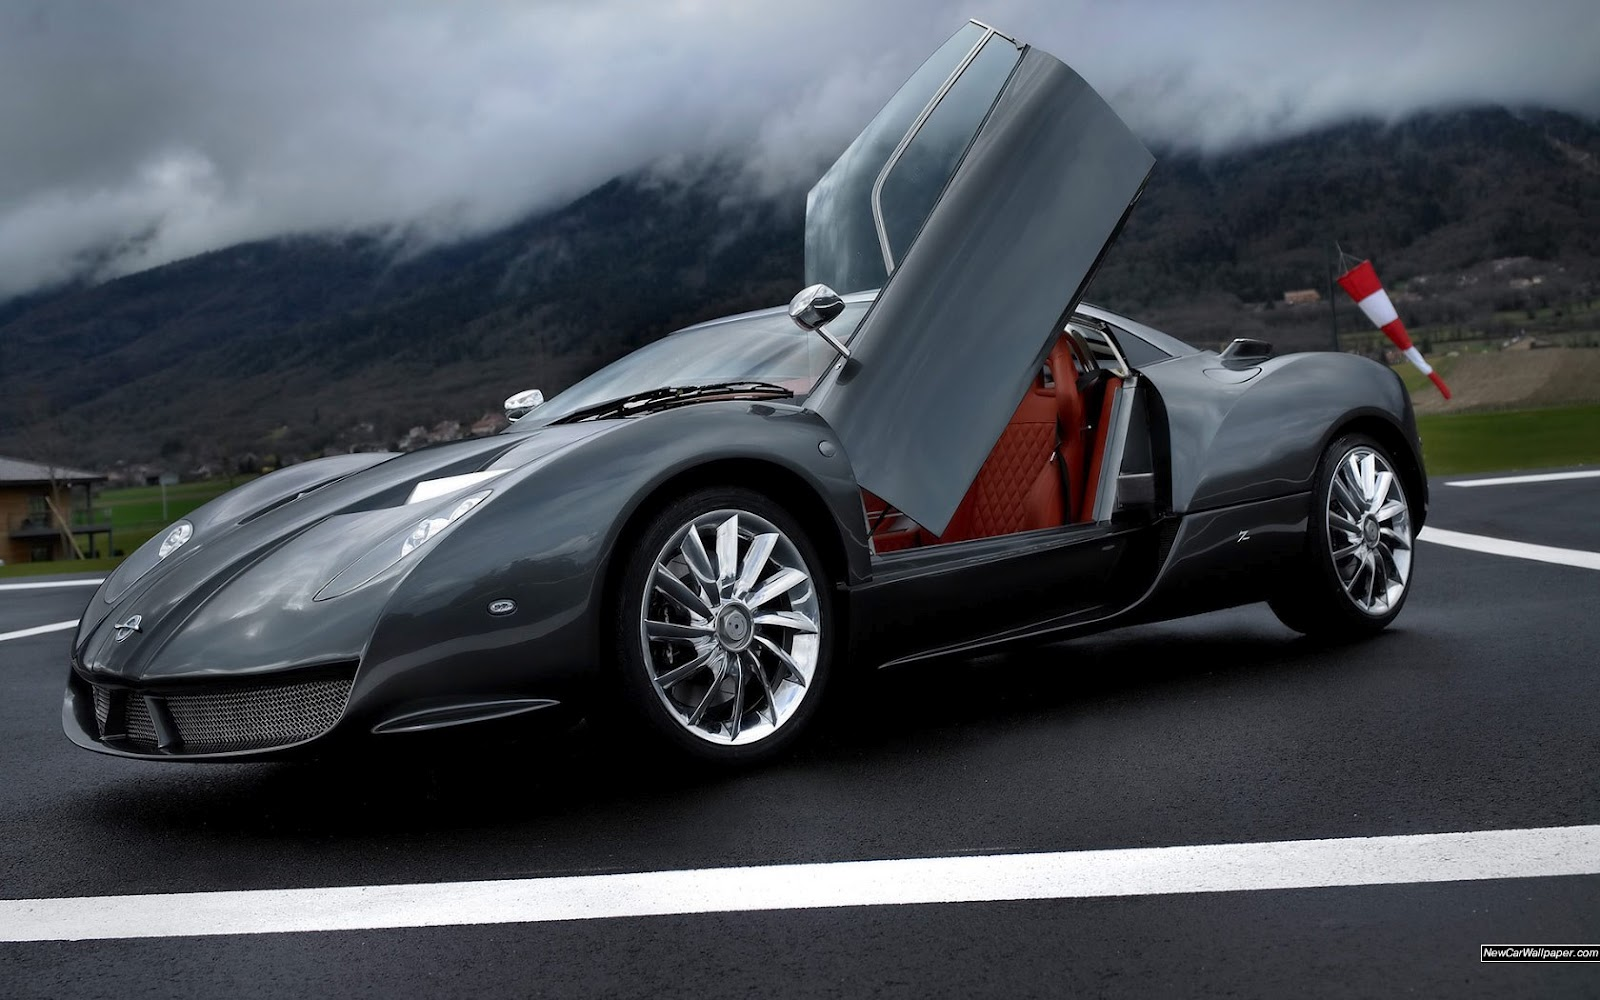 Modified Fast Cars Wallpaper 1600x1000